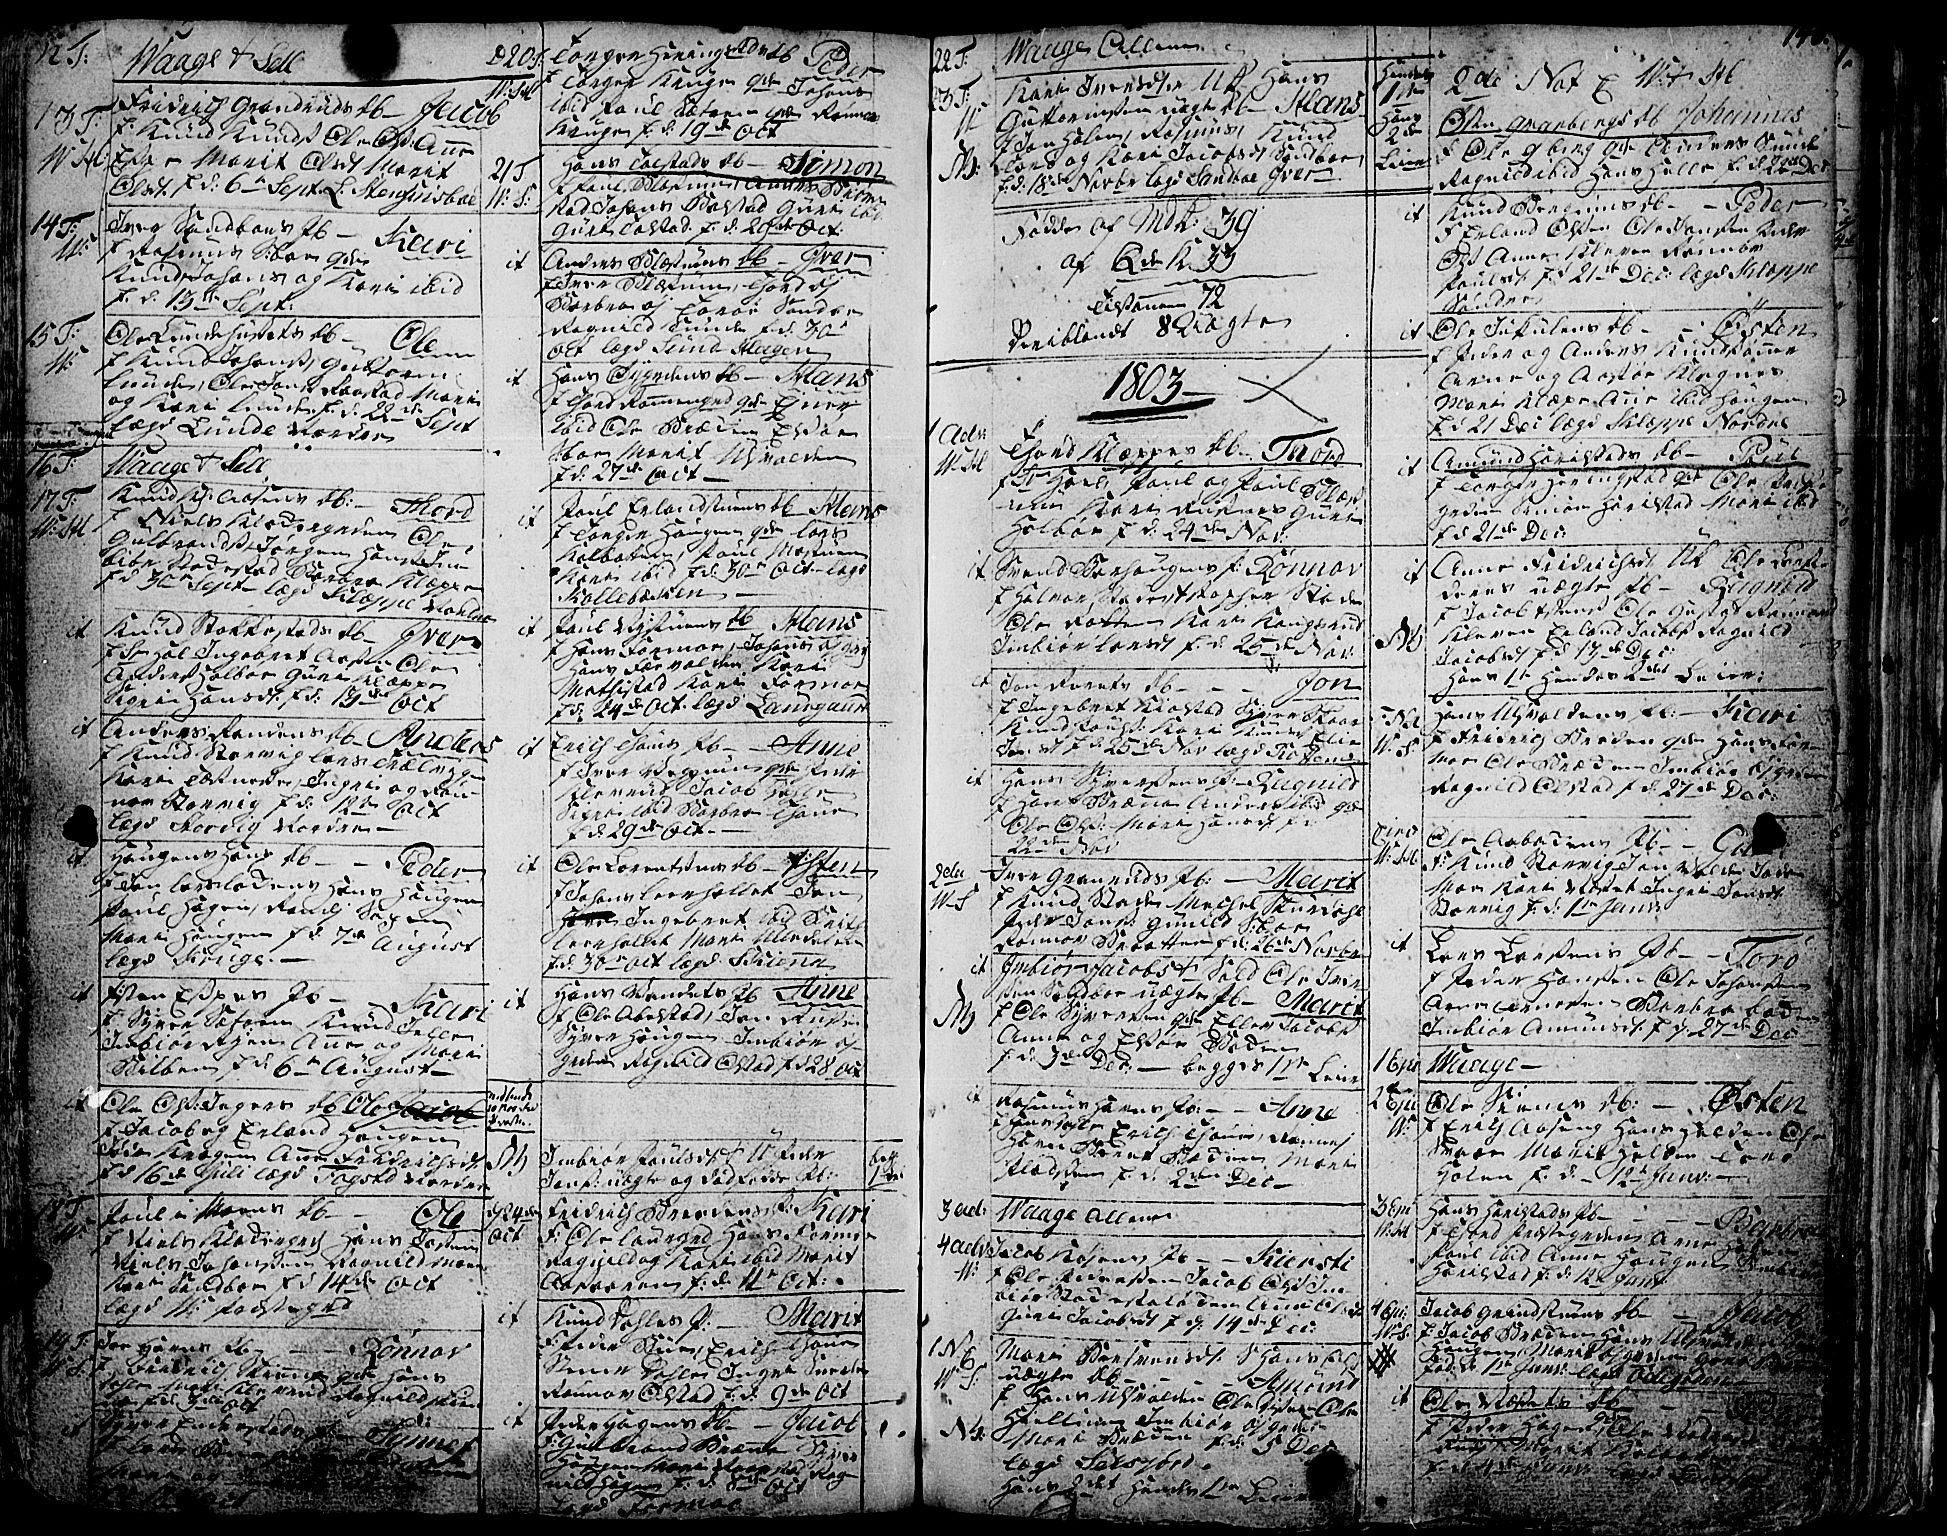 SAH, Vågå prestekontor, Ministerialbok nr. 1, 1739-1810, s. 140